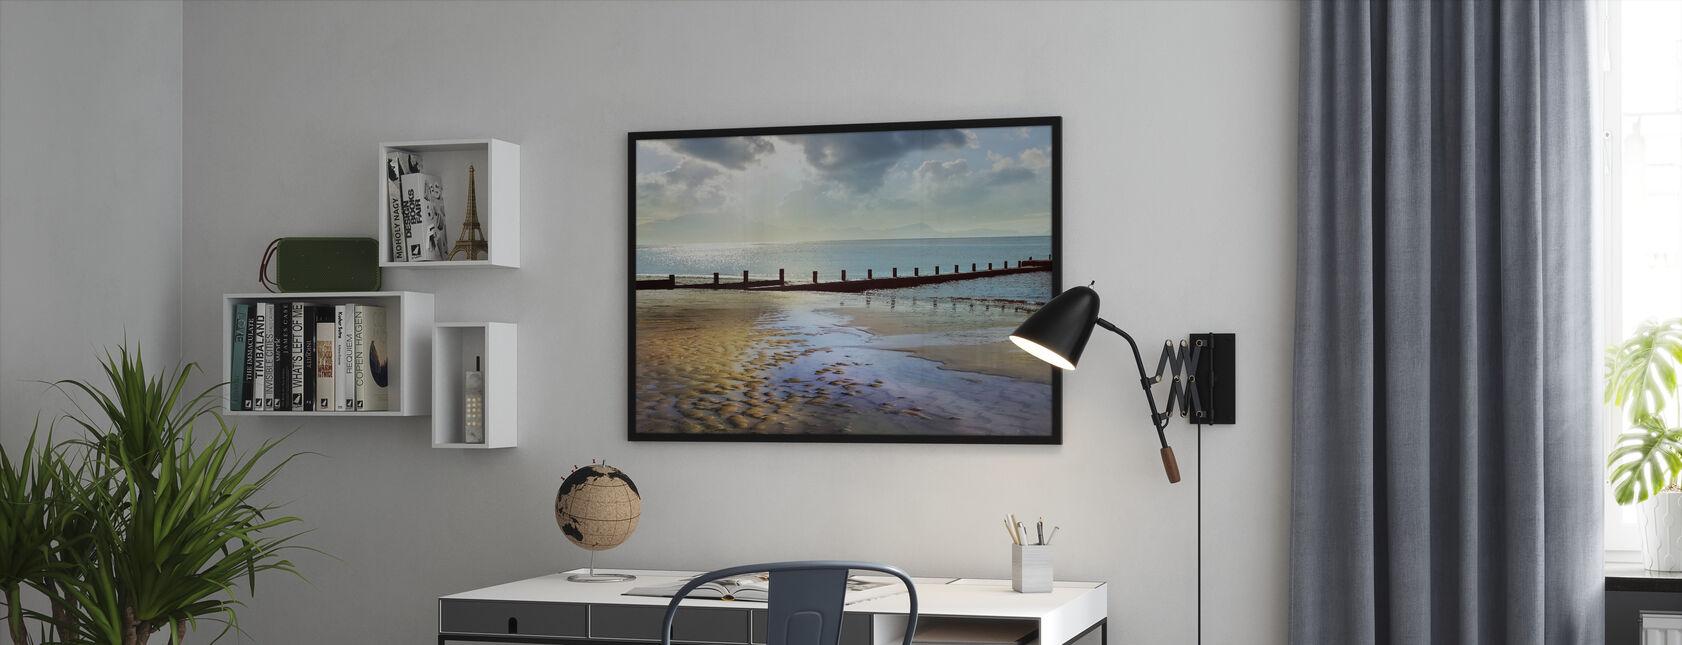 Beachline Zonnig Uitzicht - Ingelijste print - Kantoor